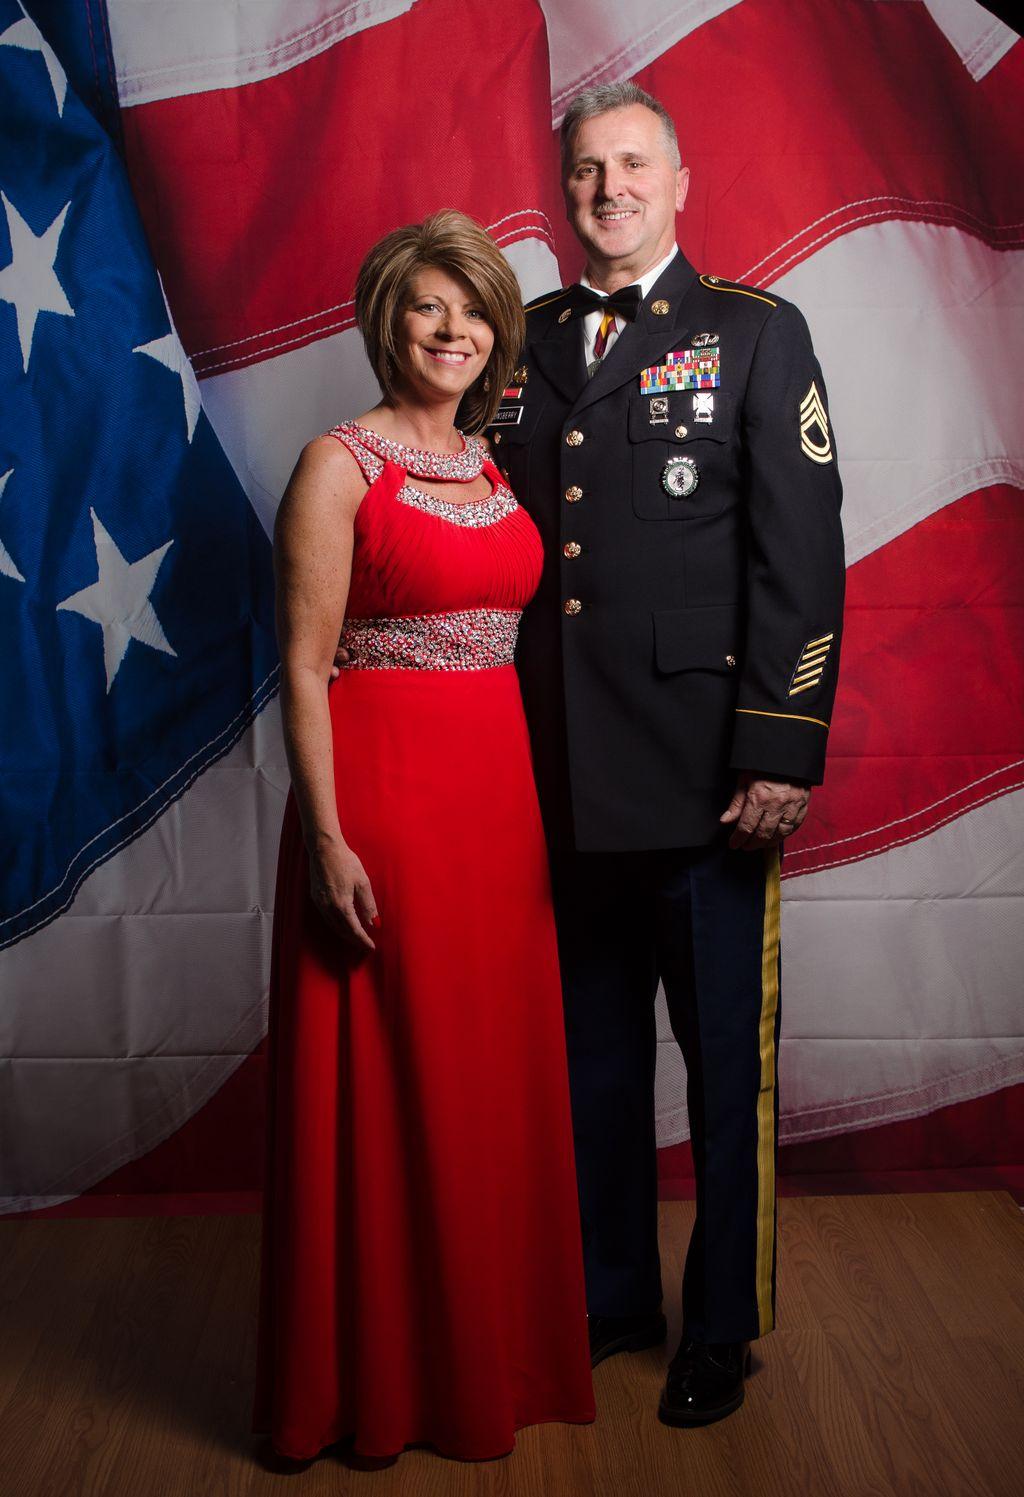 National Guard Ball